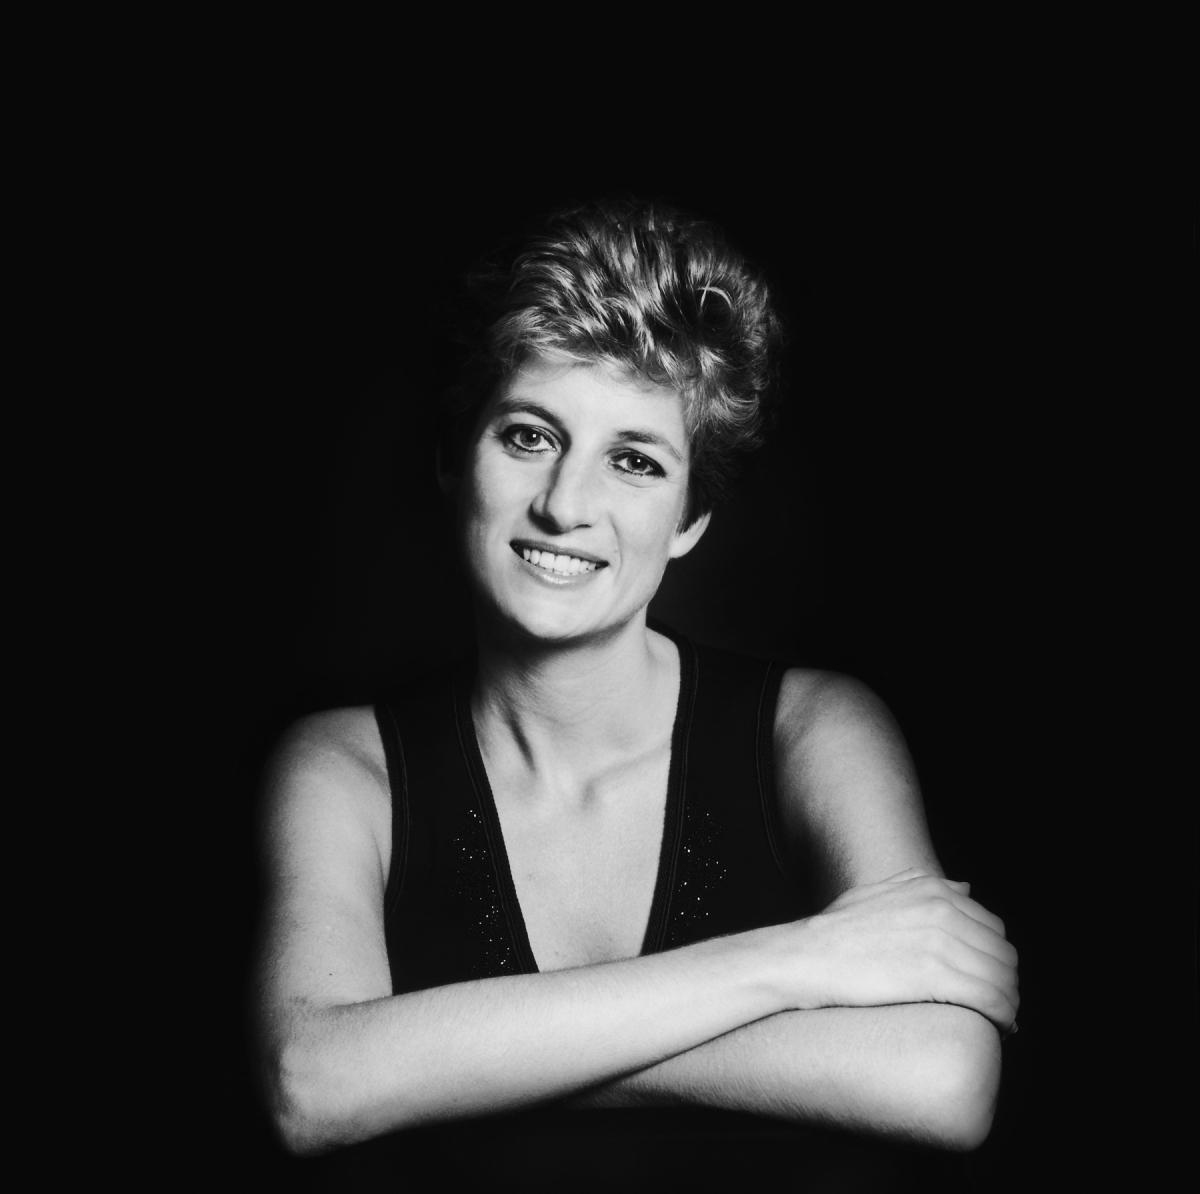 Beautiful Wallpapers: lady Diana wallpaper